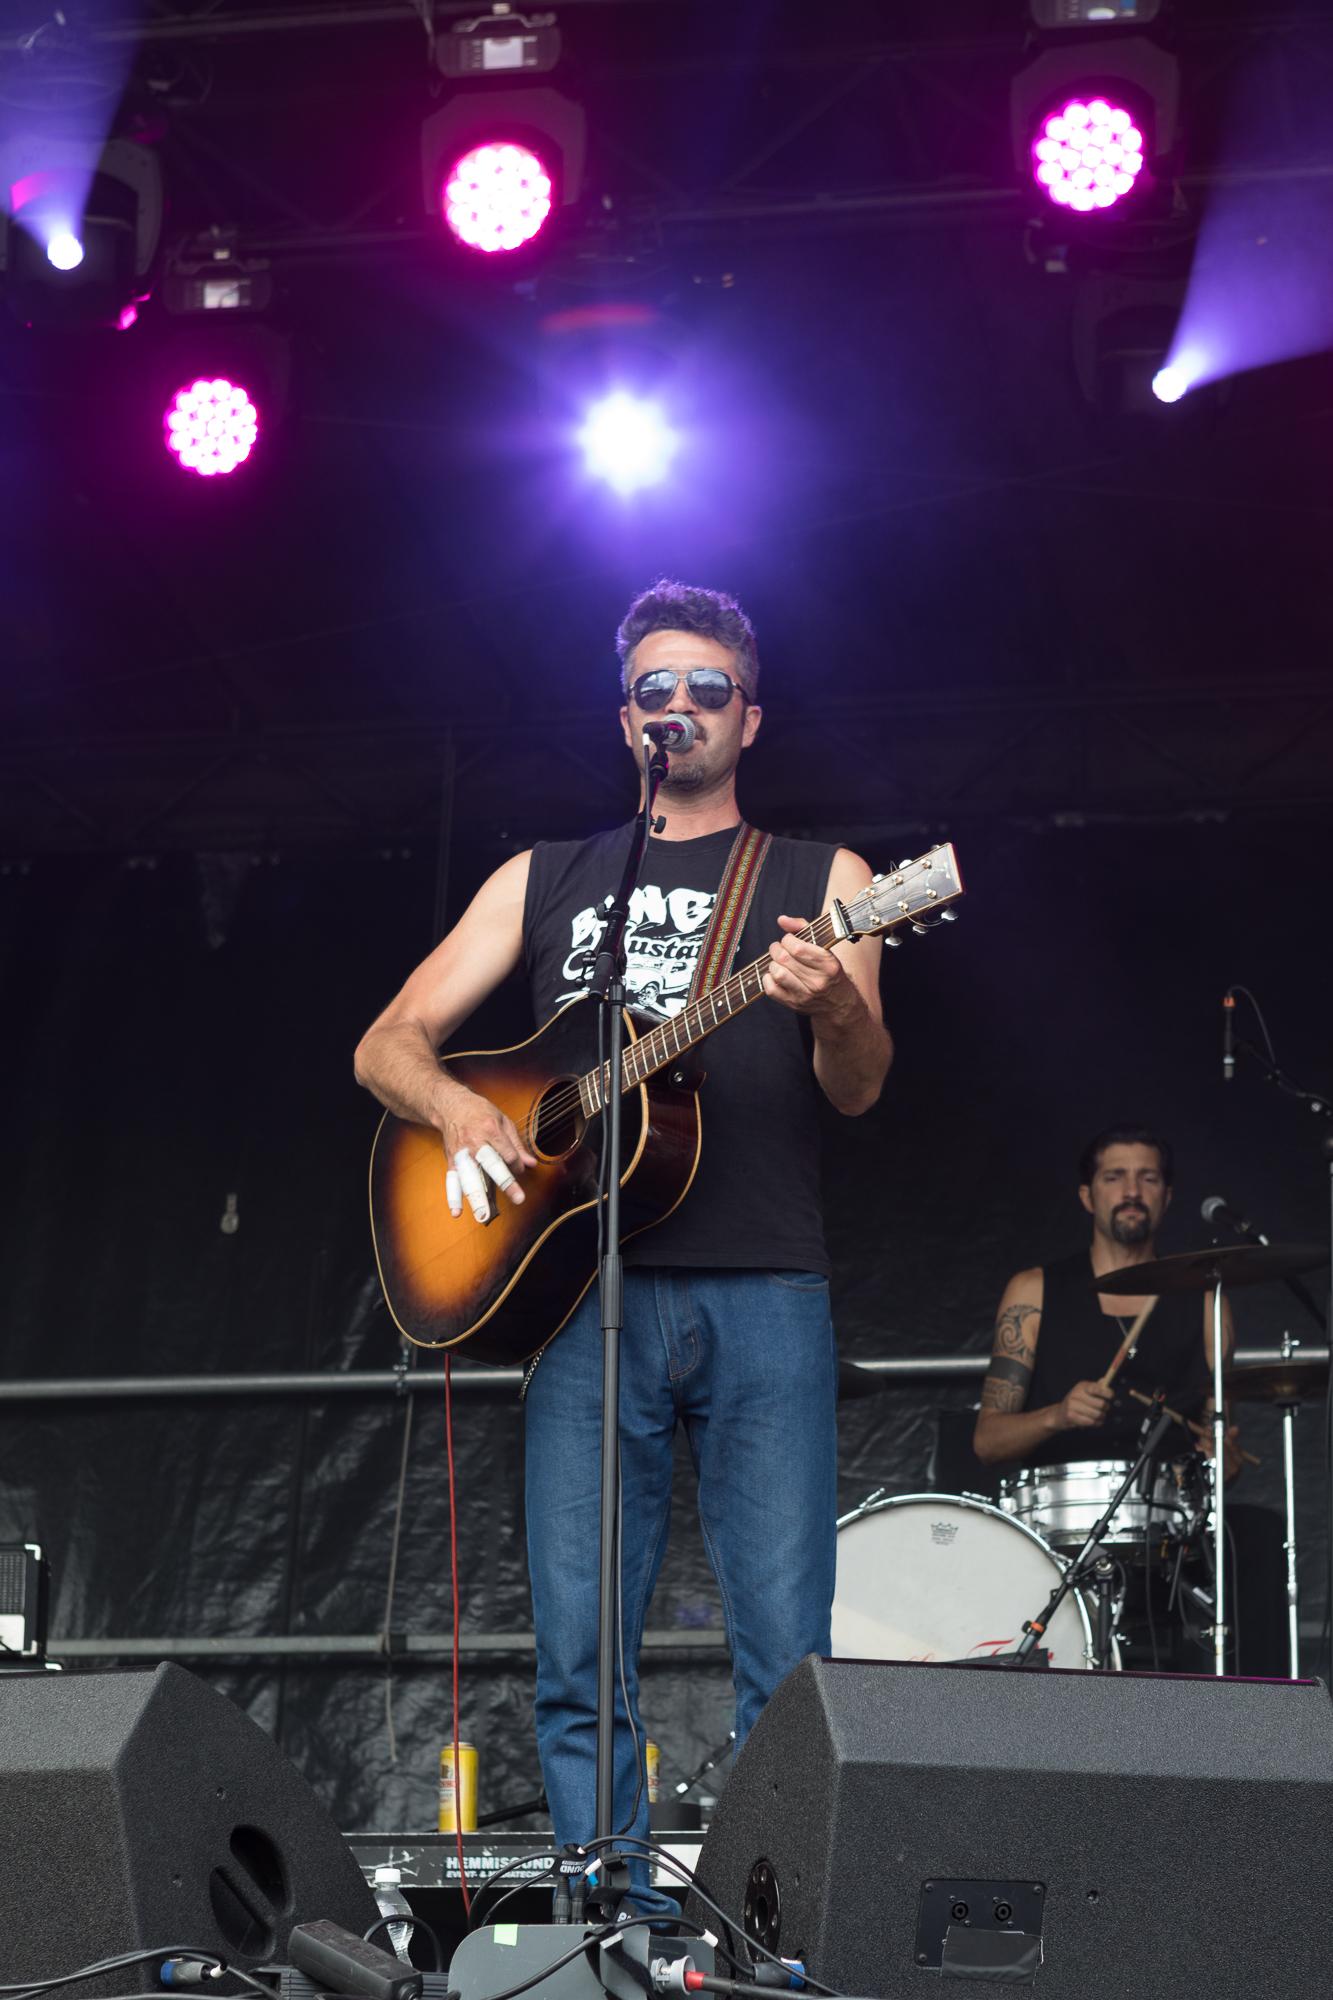 2018-06-21_The-Rob-Ryan-Roadshow-003